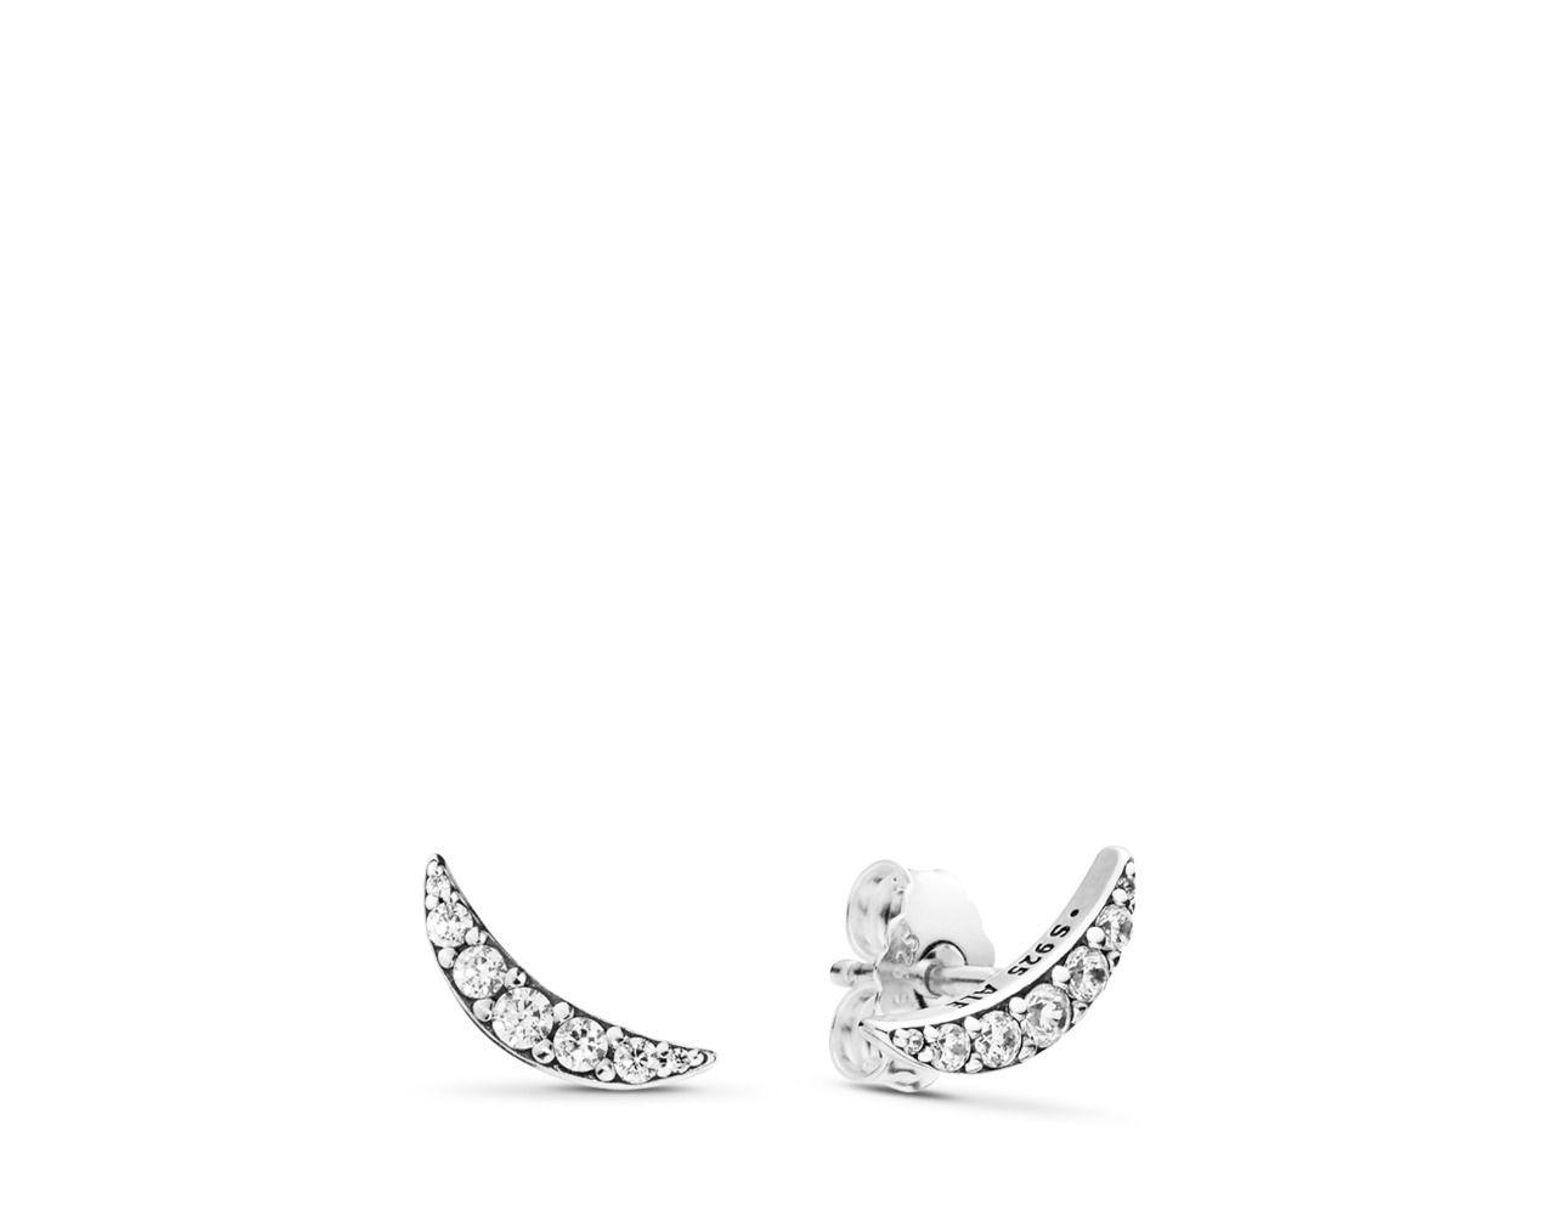 81e9b7d02 PANDORA Lunar Light Stud Earrings in Metallic - Lyst